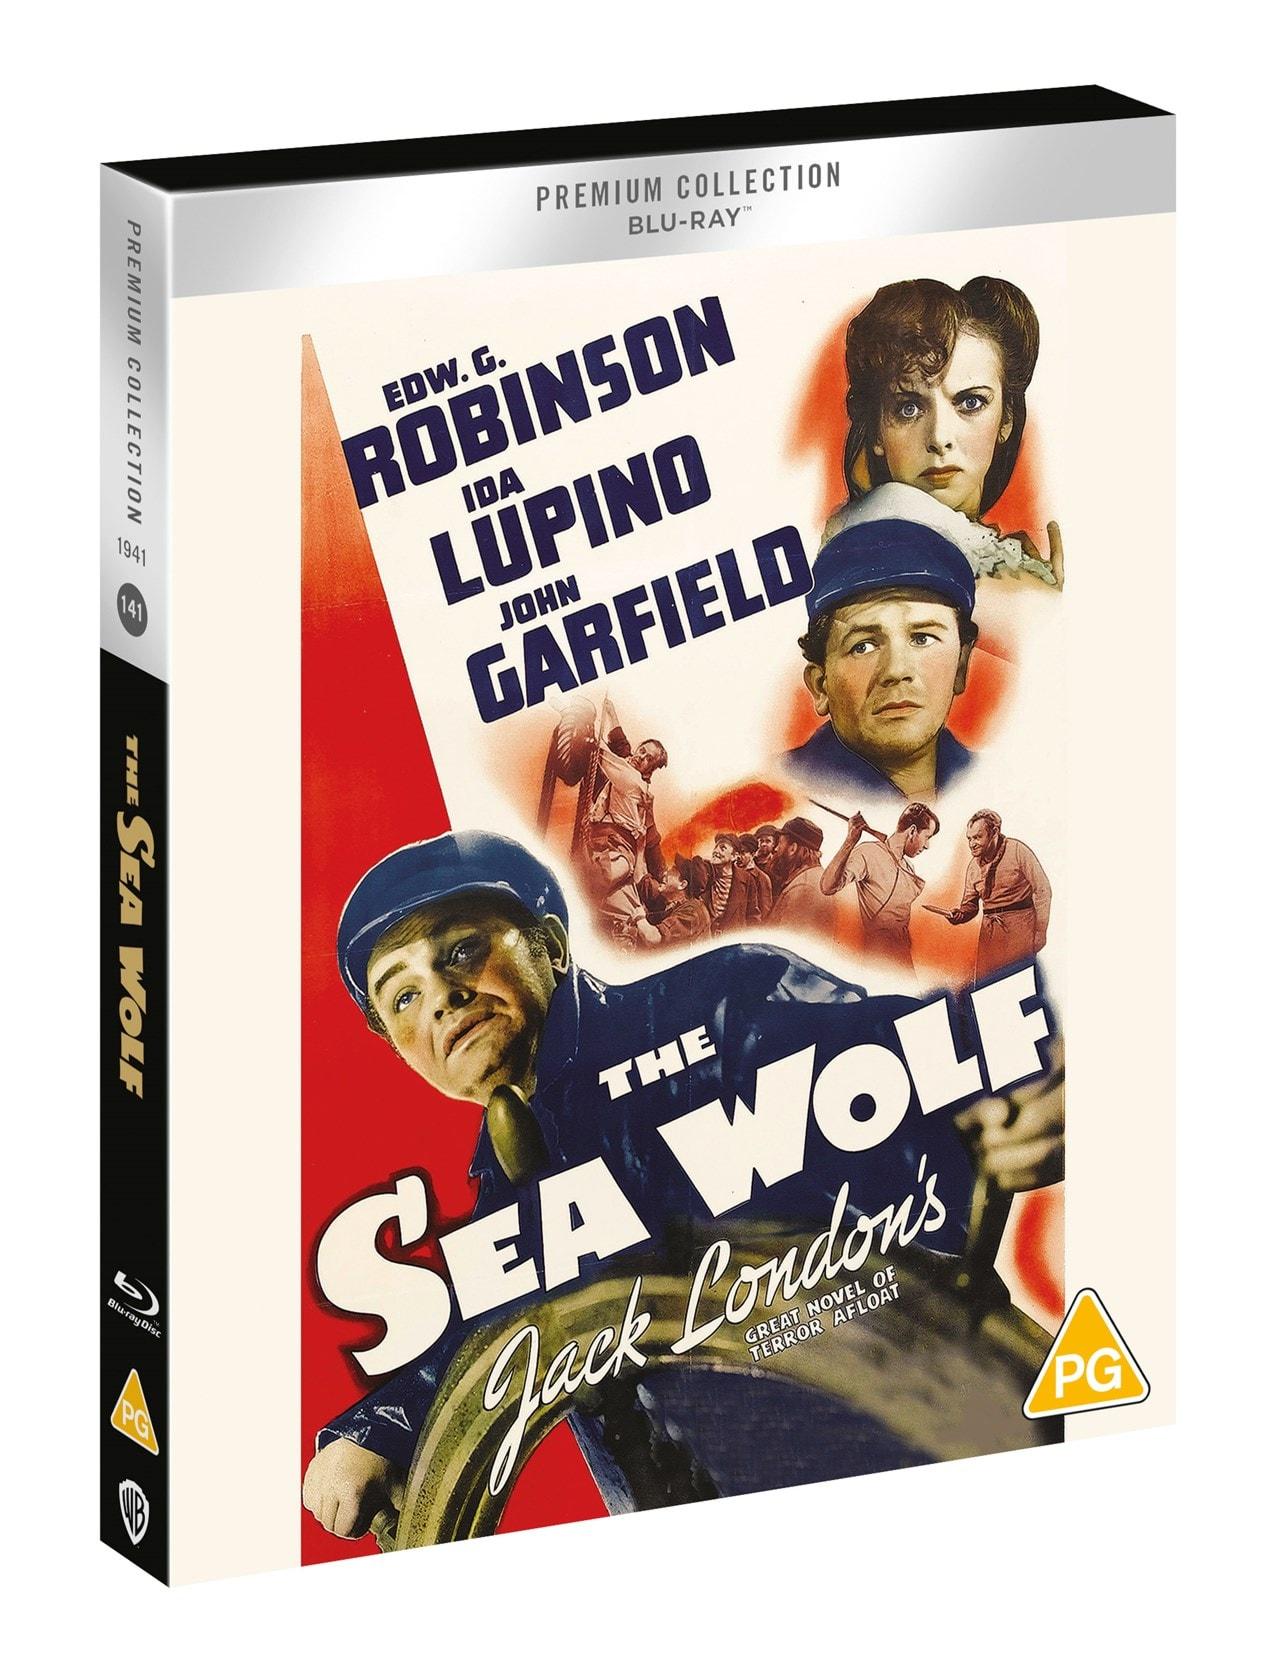 The Sea Wolf (hmv Exclusive) - The Premium Collection - 2